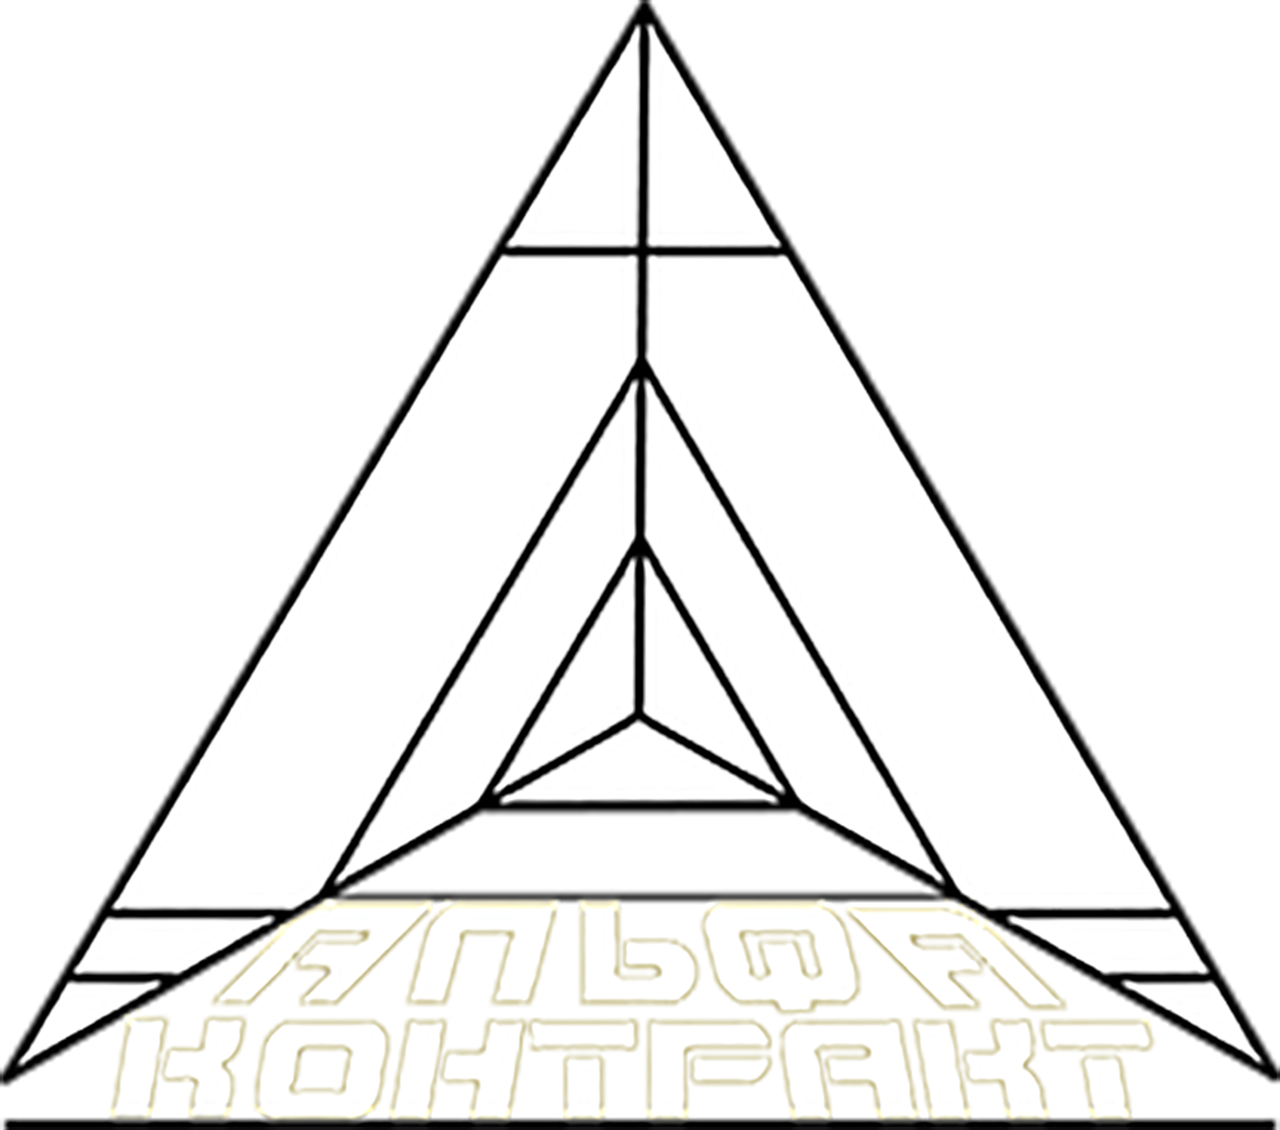 Дизайнер для разработки логотипа компании фото f_9195bfc64227f629.png